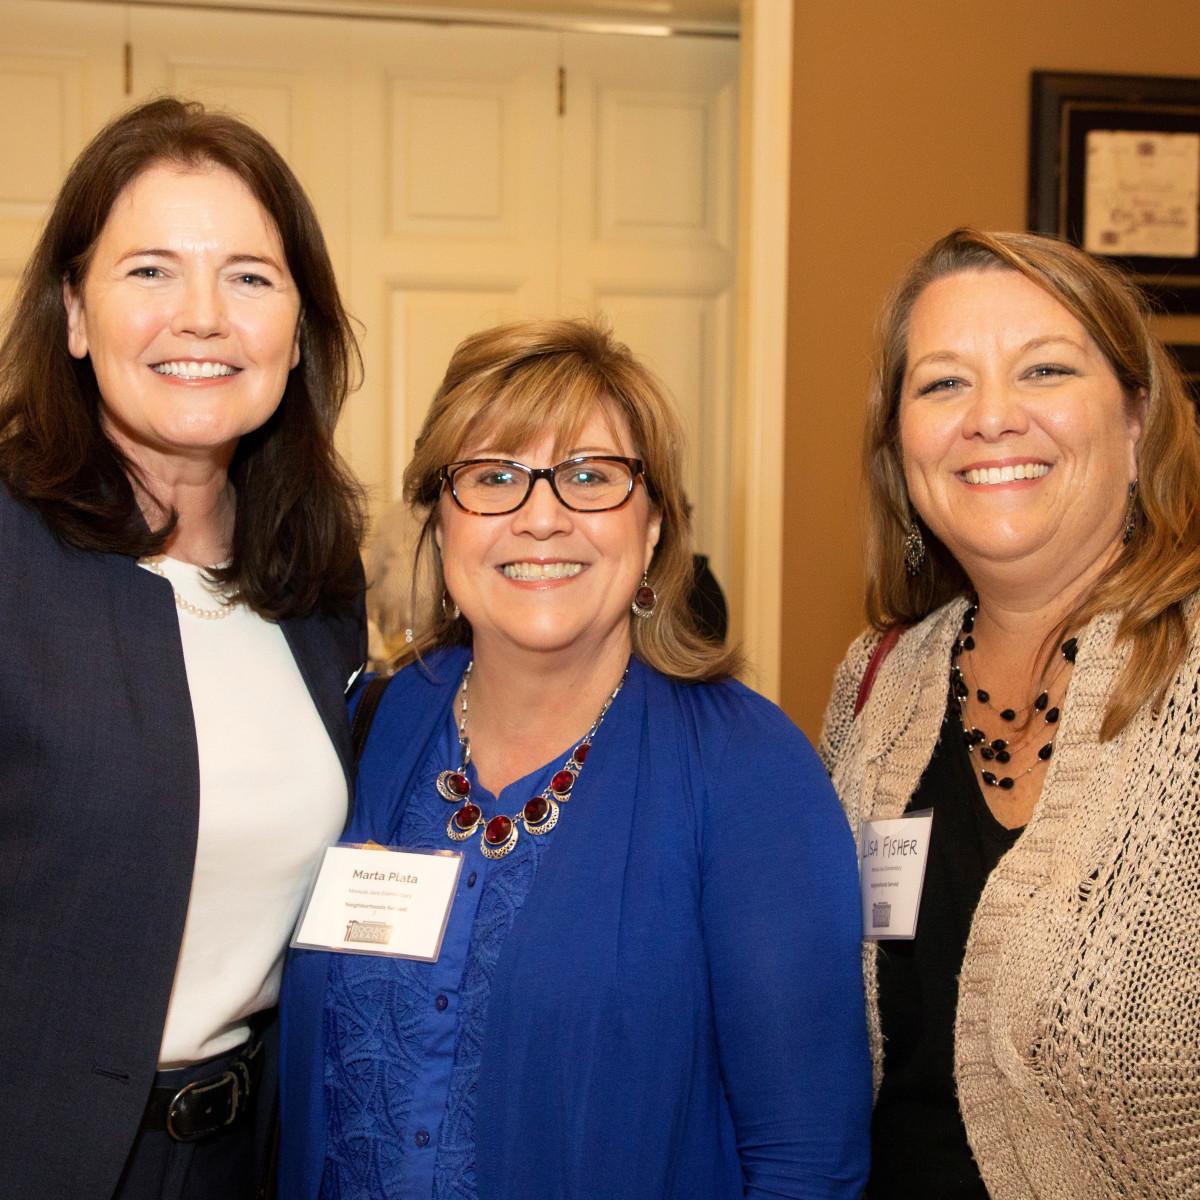 North Texas Community Foundation, Rose Bradshaw, Marta Plata, Lisa Fischer